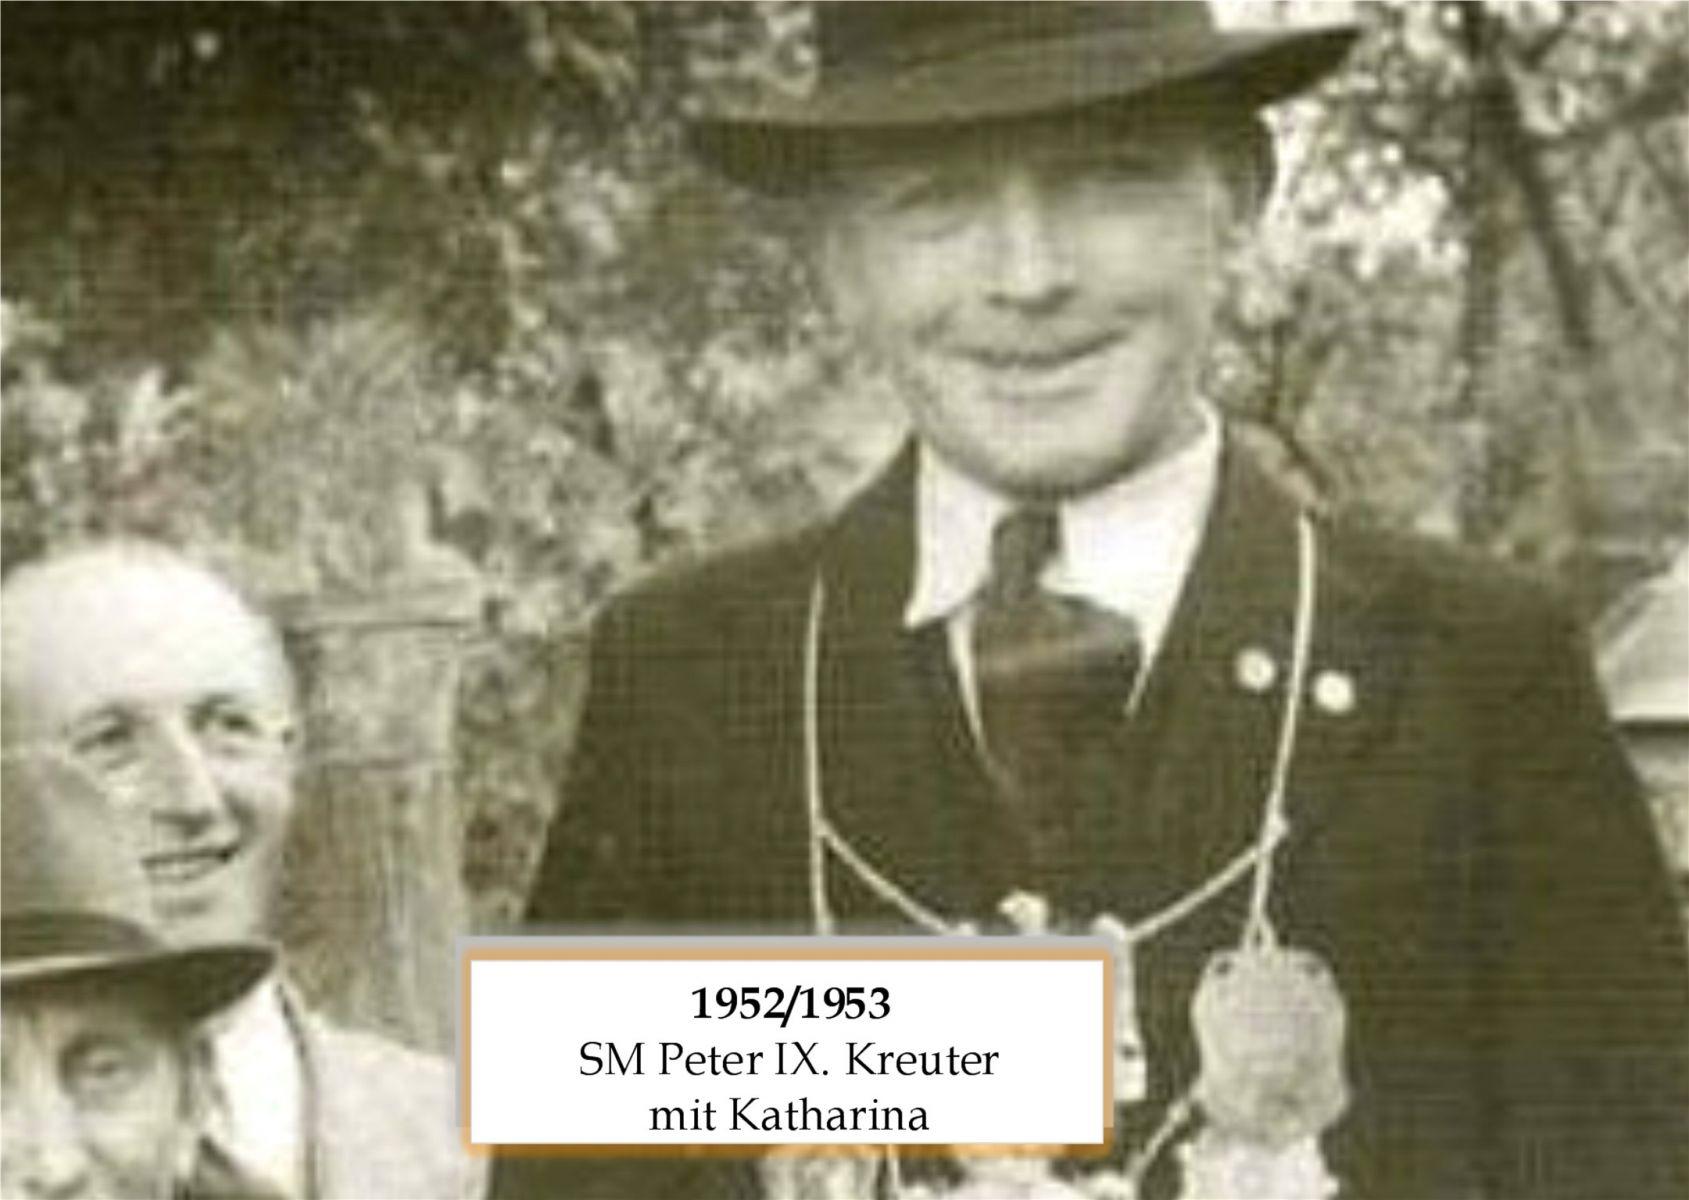 SM 1952/53 Peter IX Kreuter mit Katharina